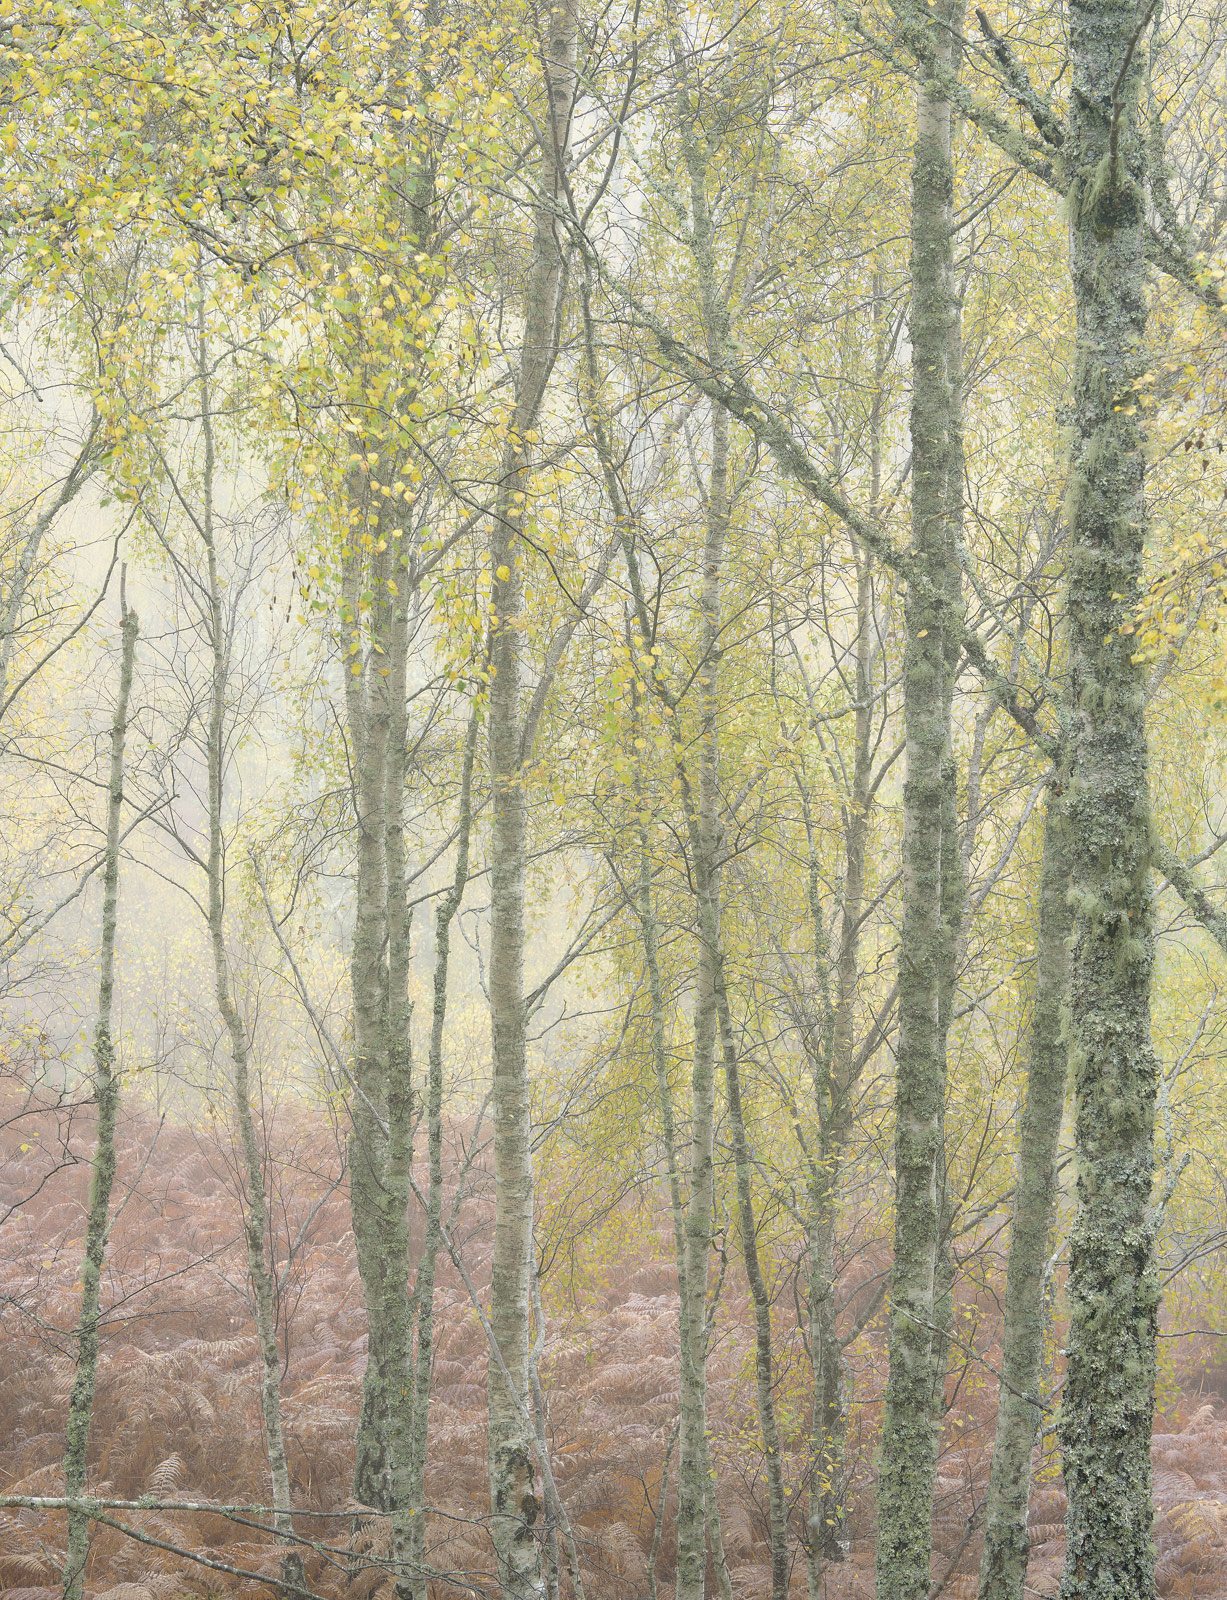 Pastel Birch Wood tapestry, morning, productive, mist, sunlight, backlit, permeating, mist, damp, autumnal, bracken, photo